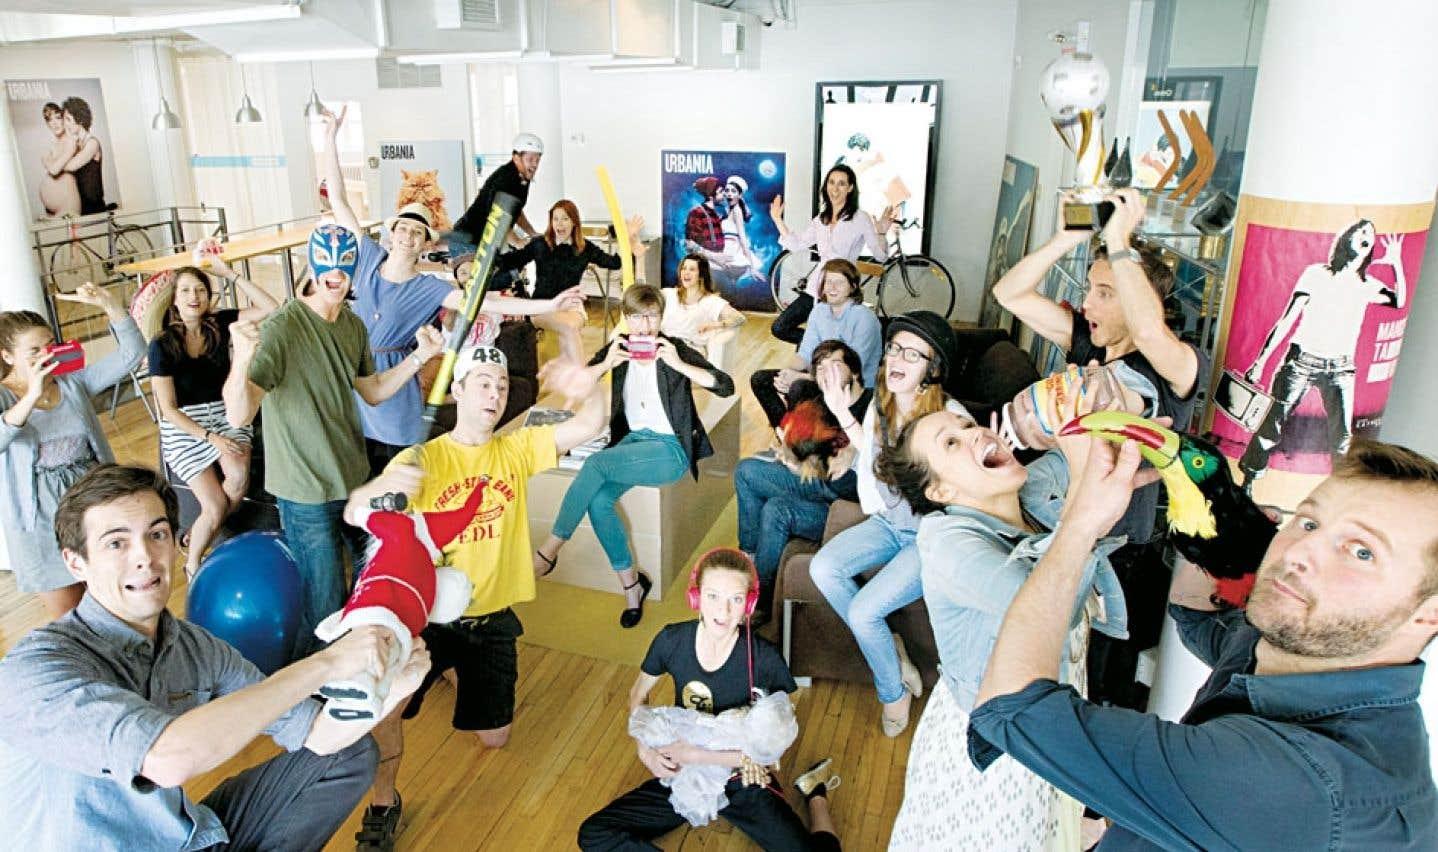 Urbania fête dix ans d'ironie concentrée